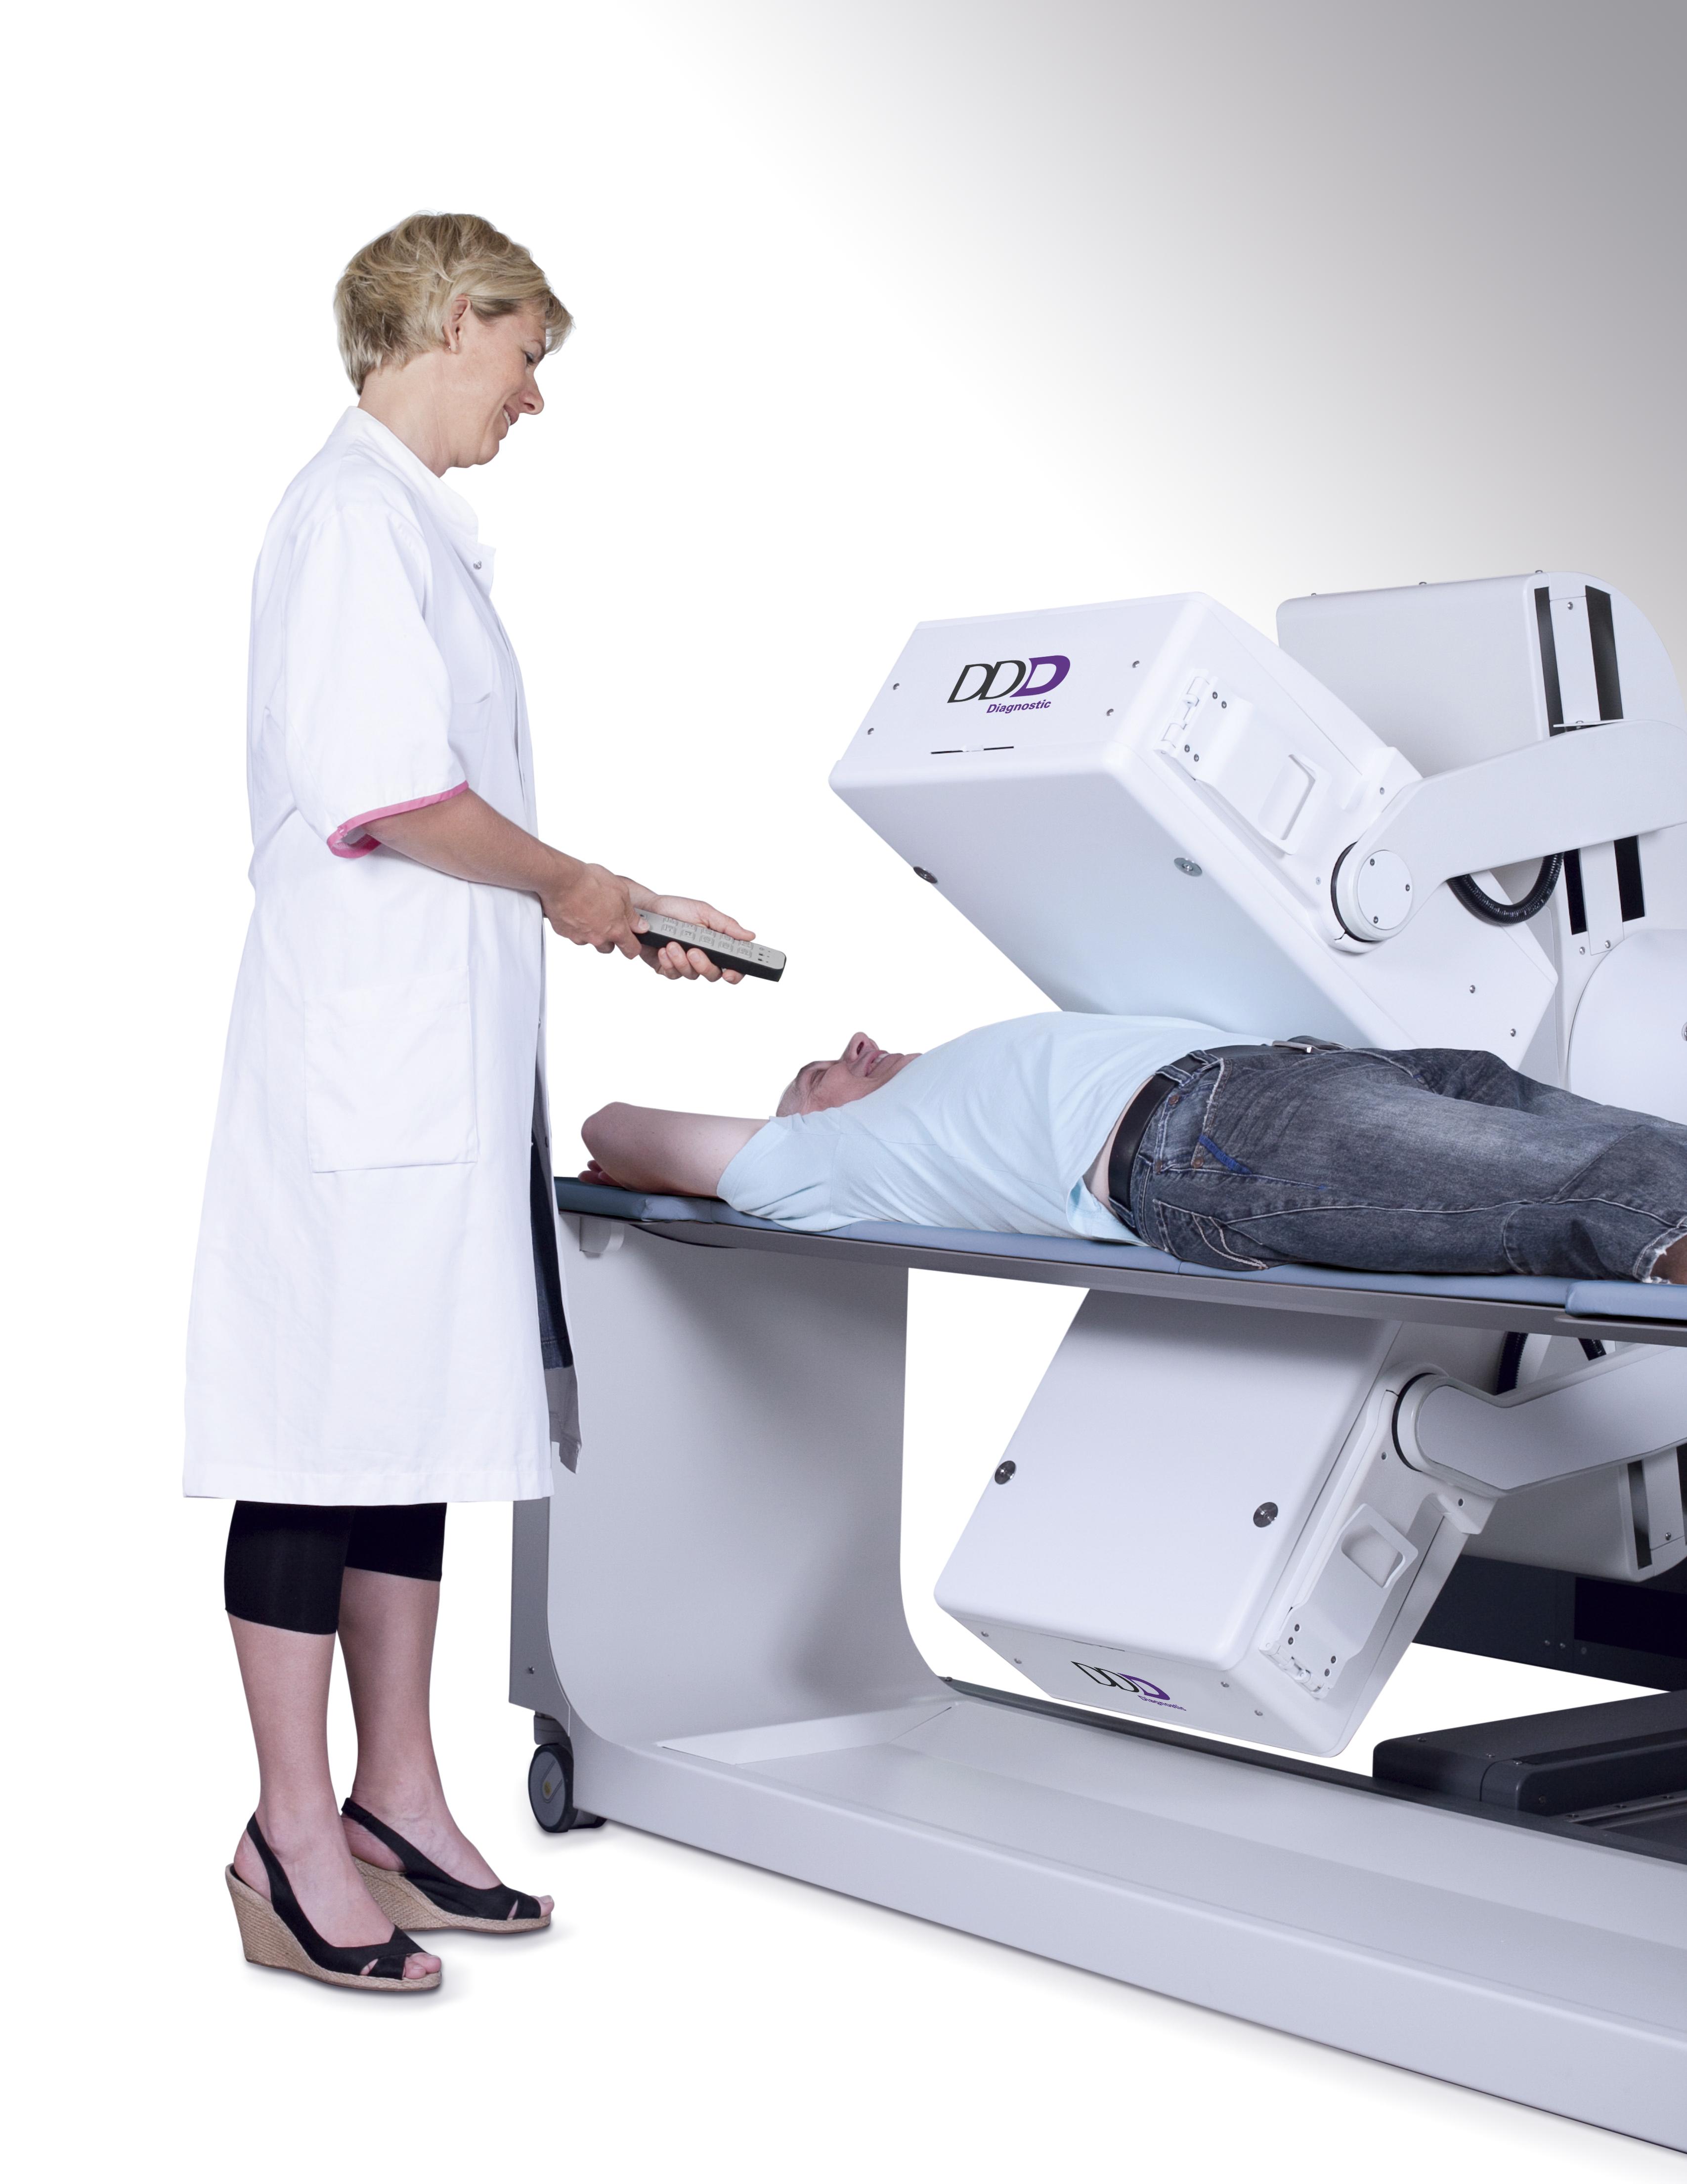 Cardiac SPECT, models